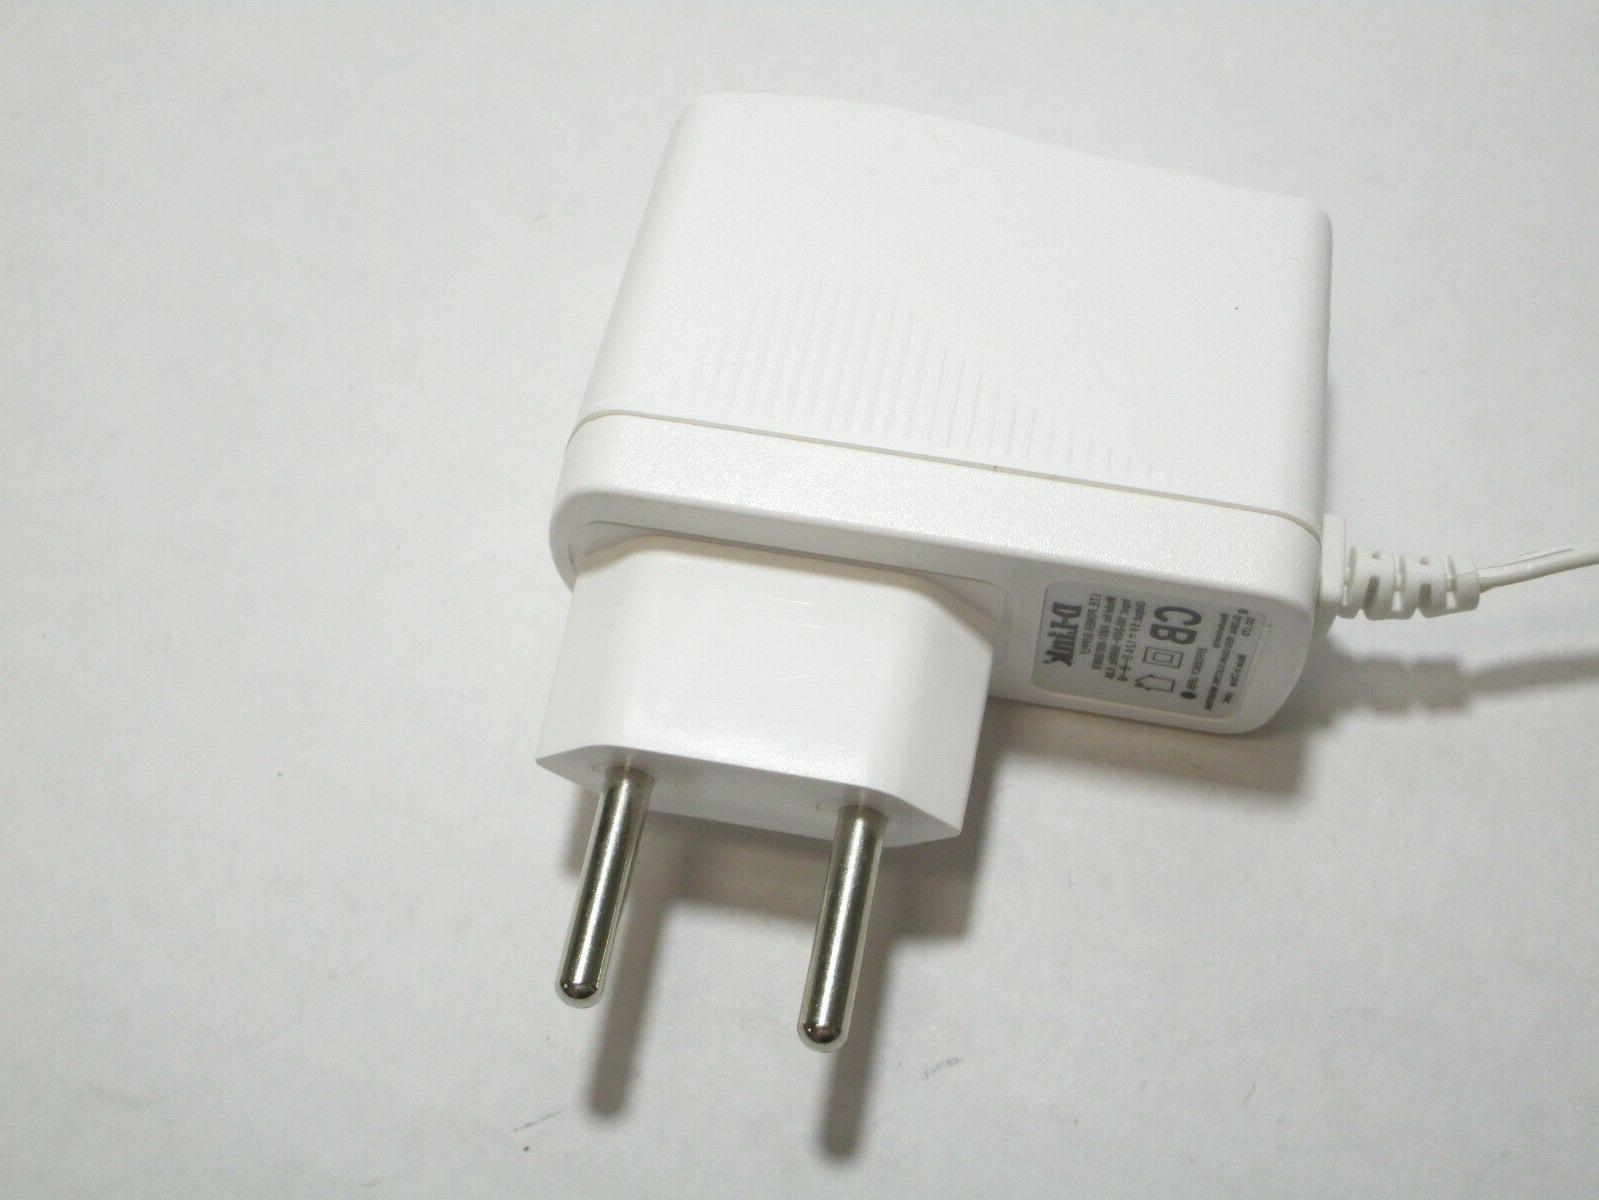 NEW D-Link DCS-2103 Security